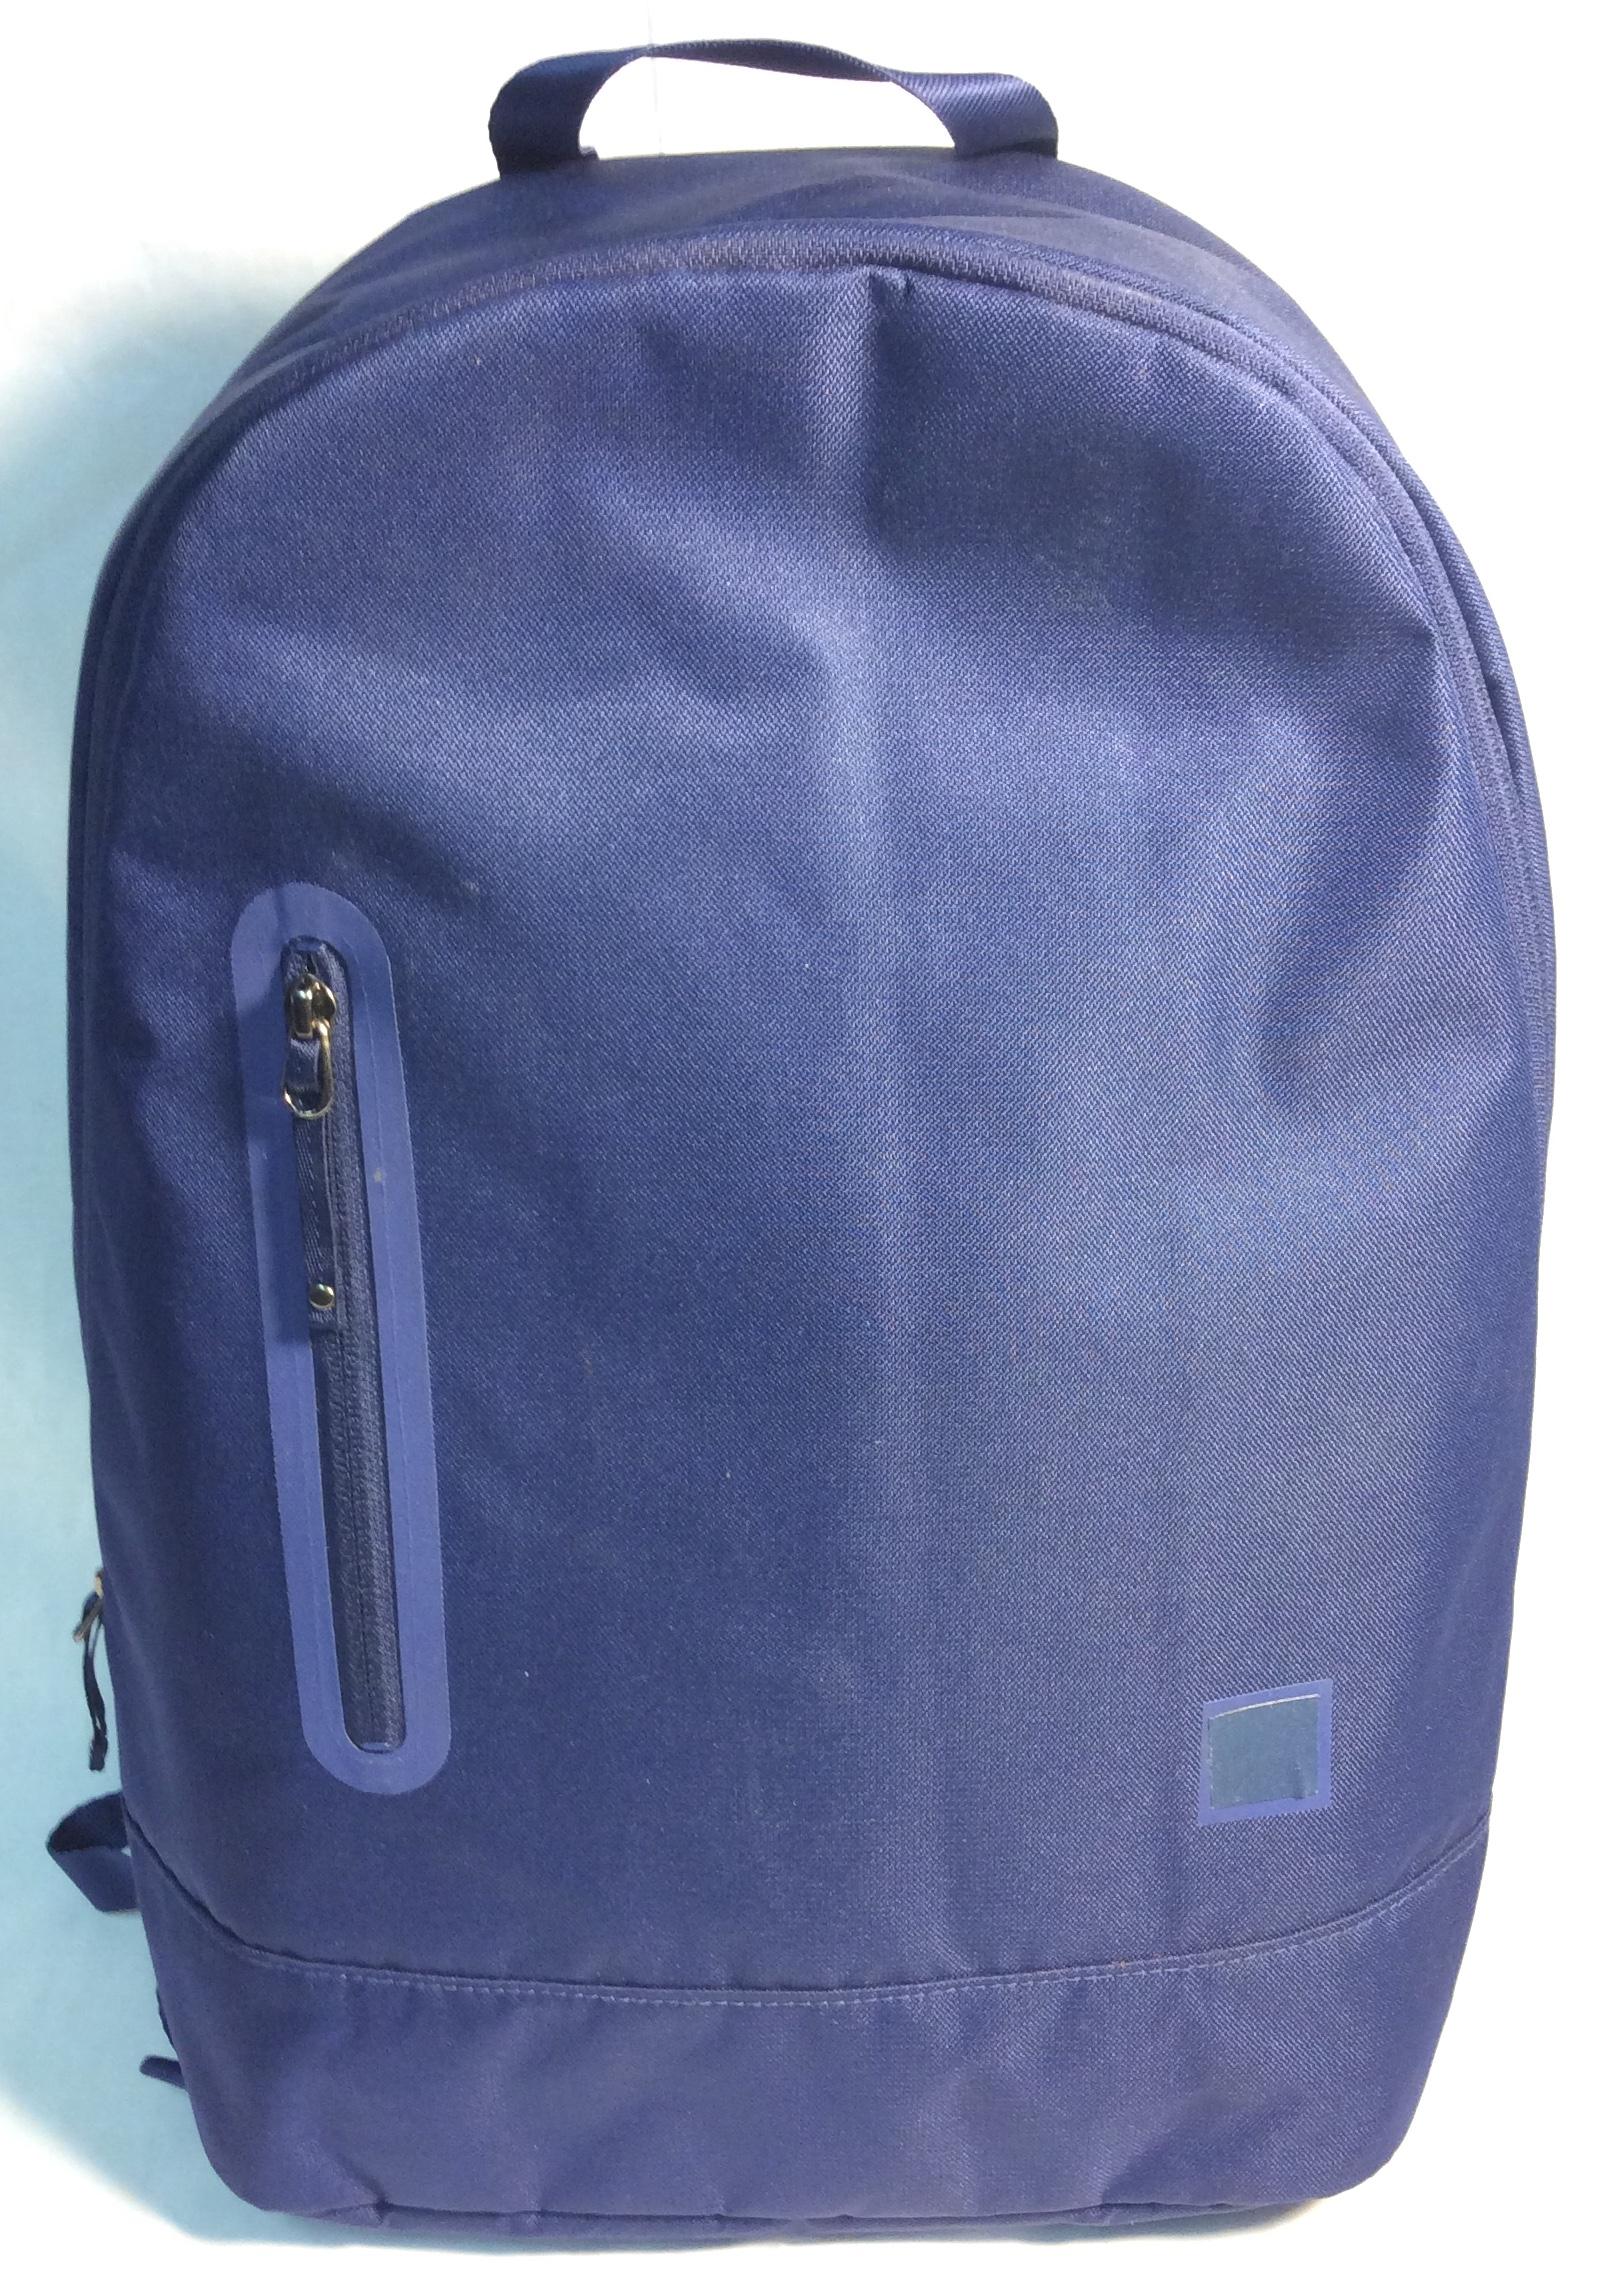 Navy Blue MEC Backpack